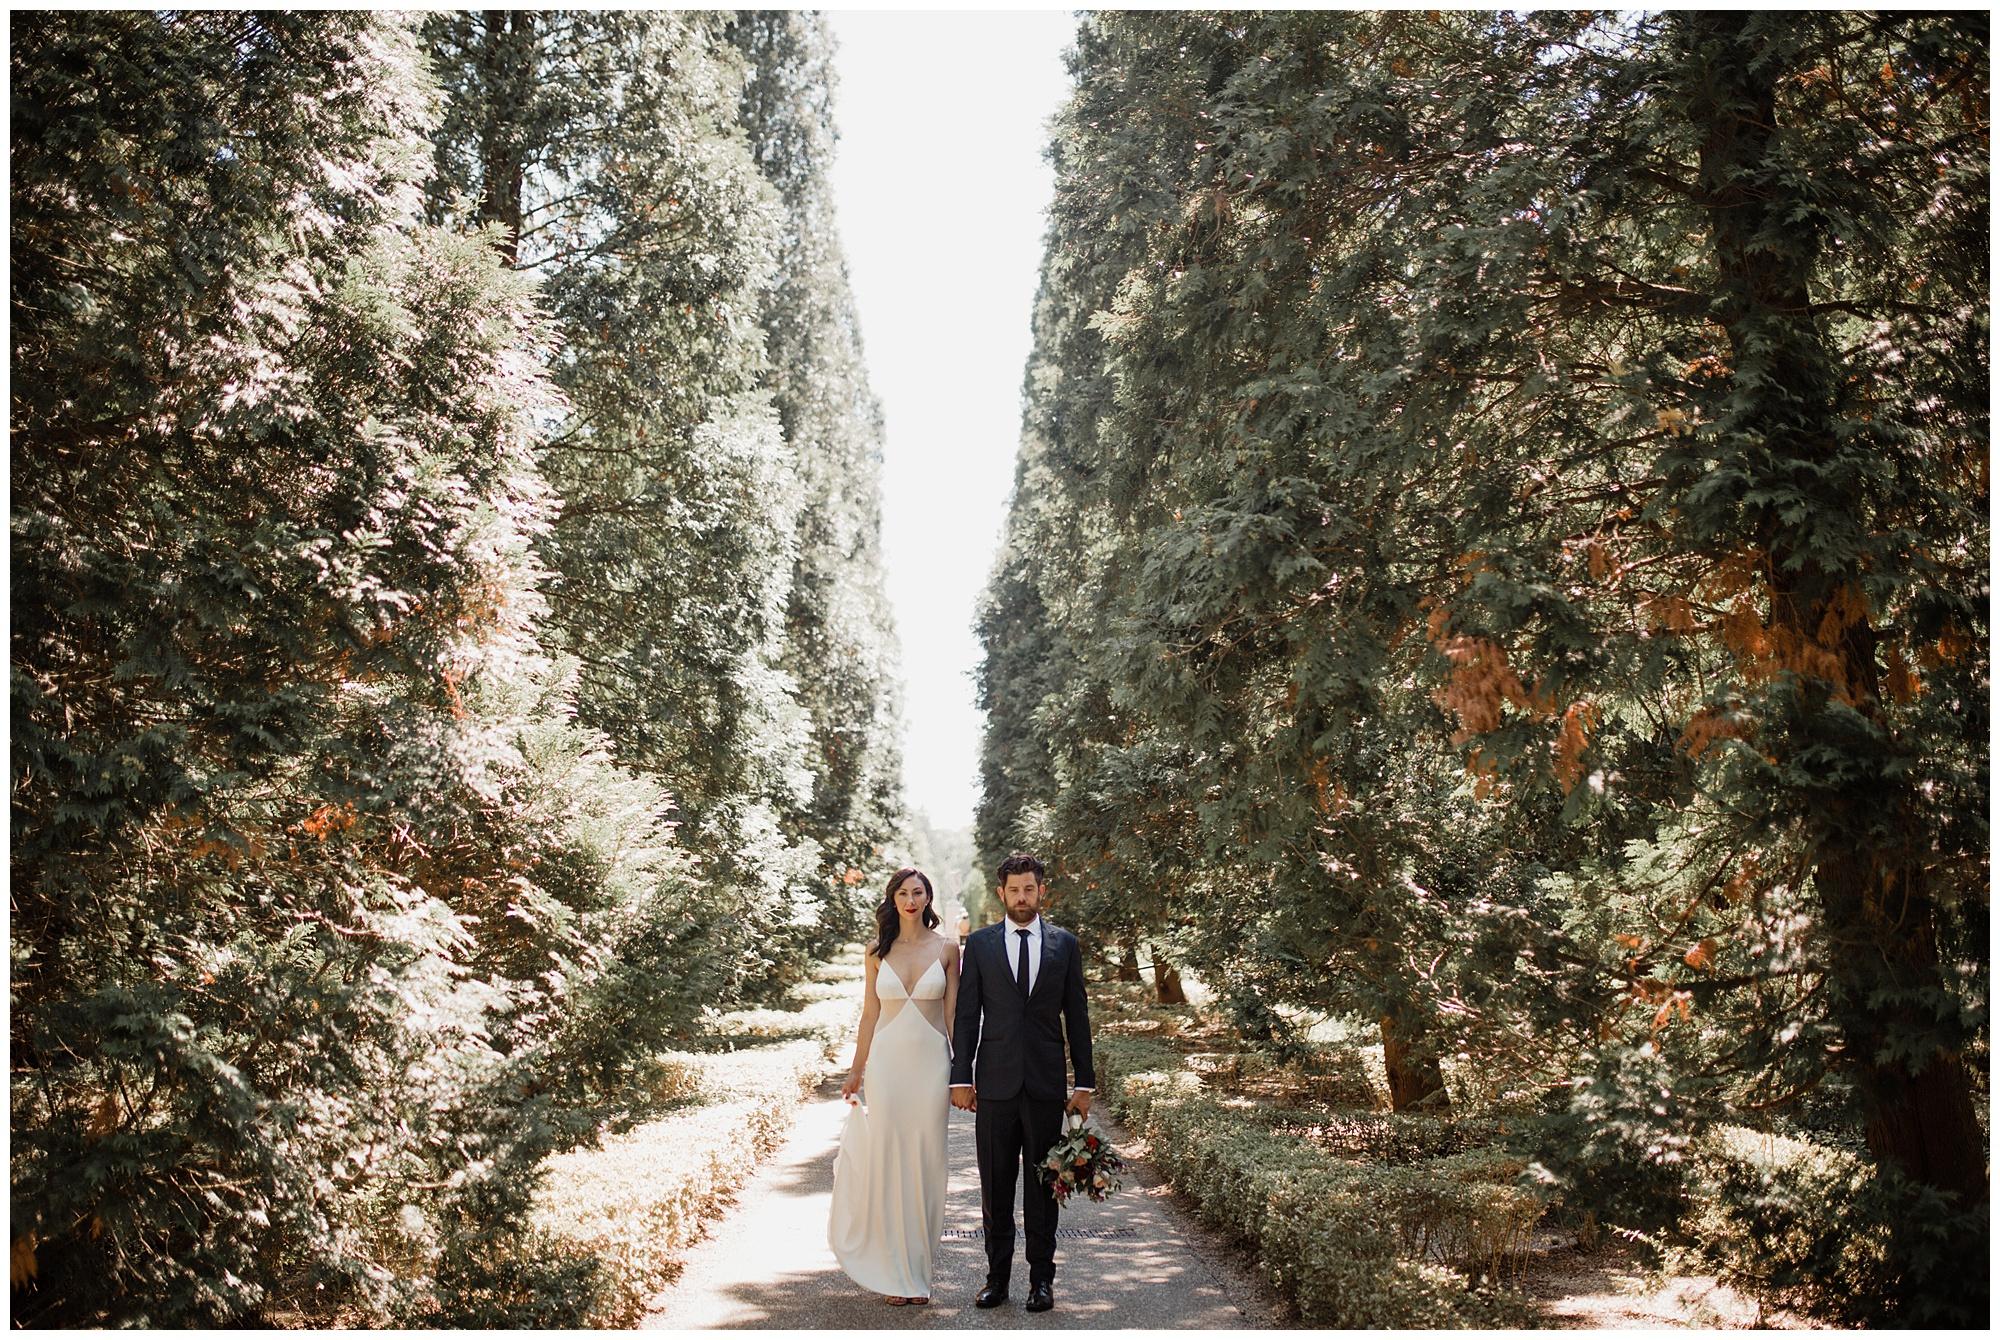 allerton_park_wedding_champaign_il_chicago_wright_photographs_ne_0071.jpg